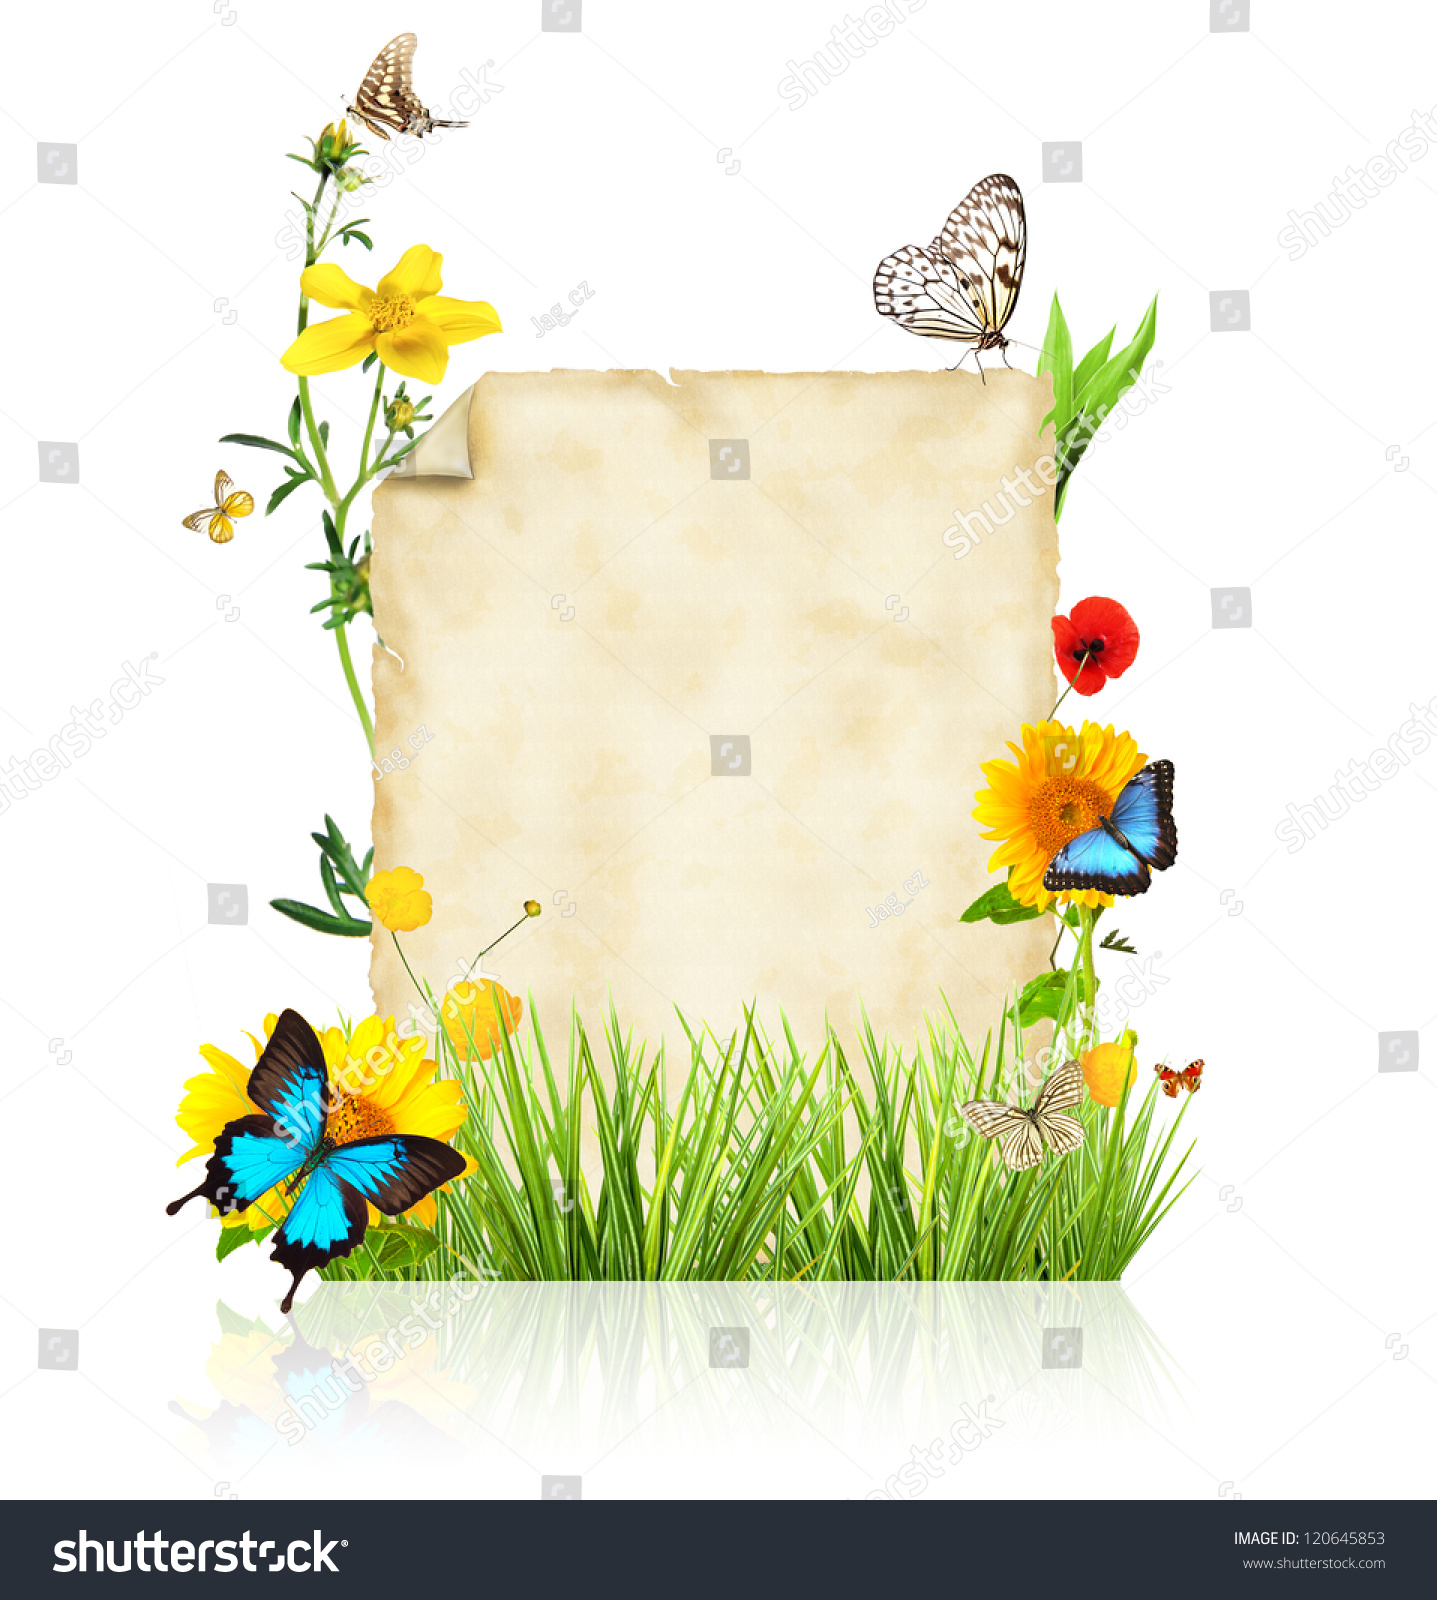 ppt 背景 背景图片 边框 模板 设计 相框 1437_1600